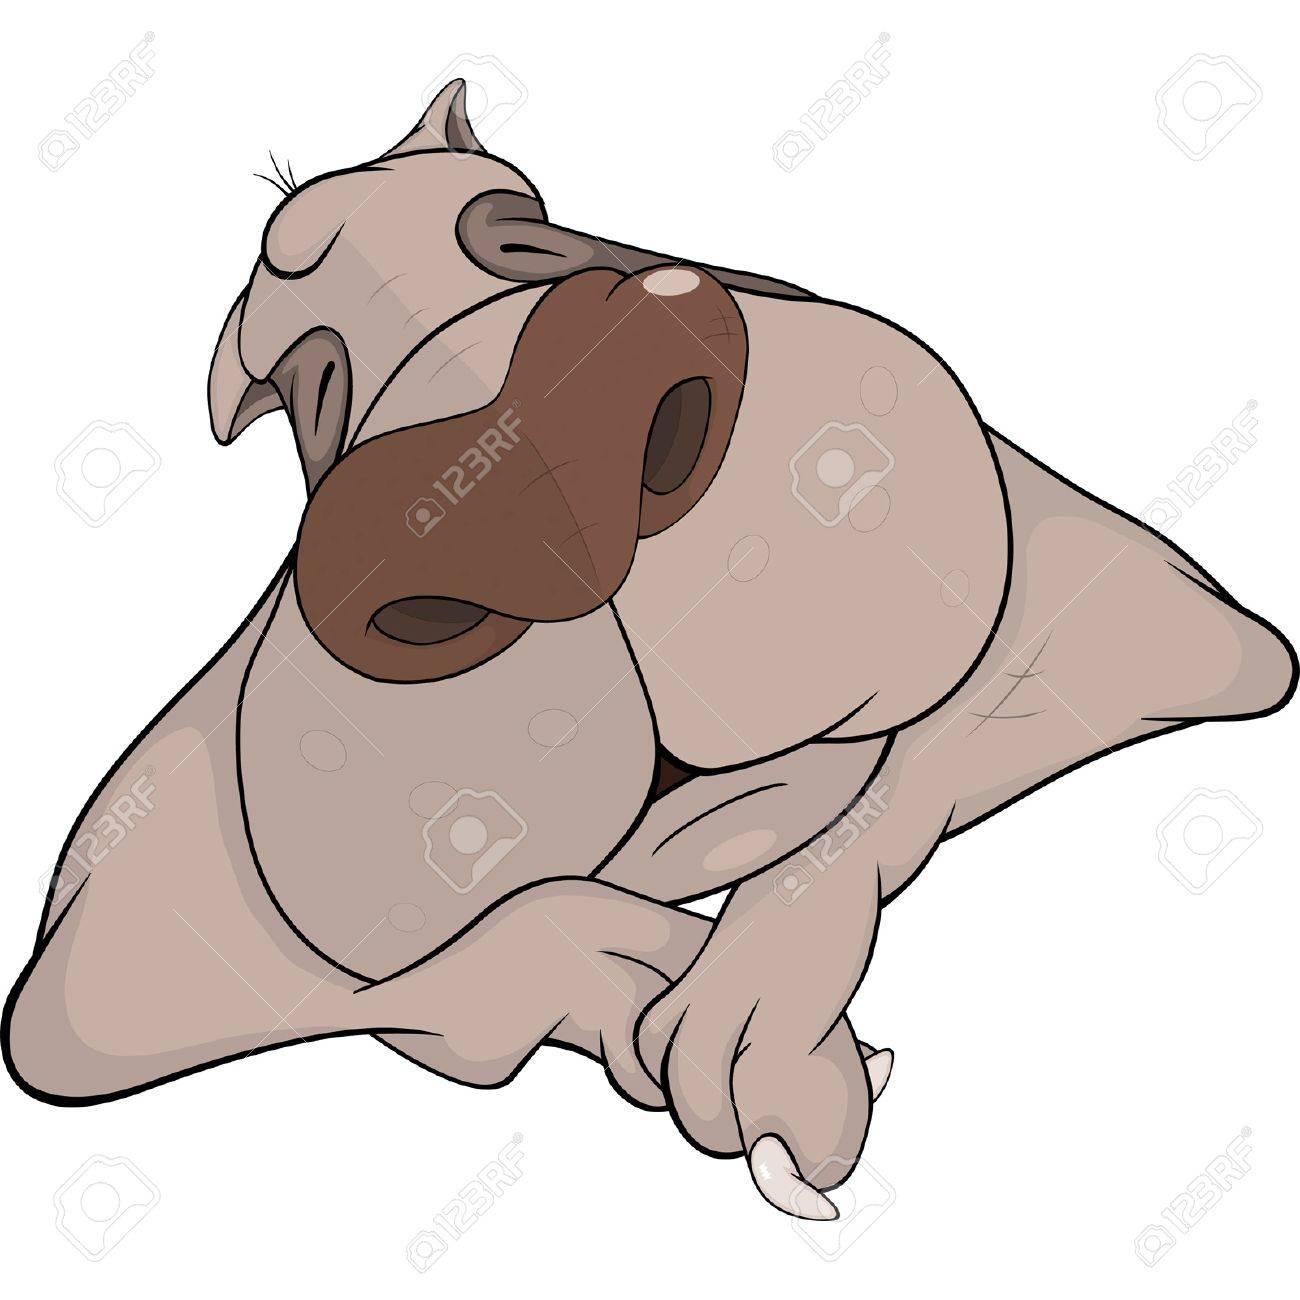 hight resolution of sleeping dog cartoon stock vector 12210427